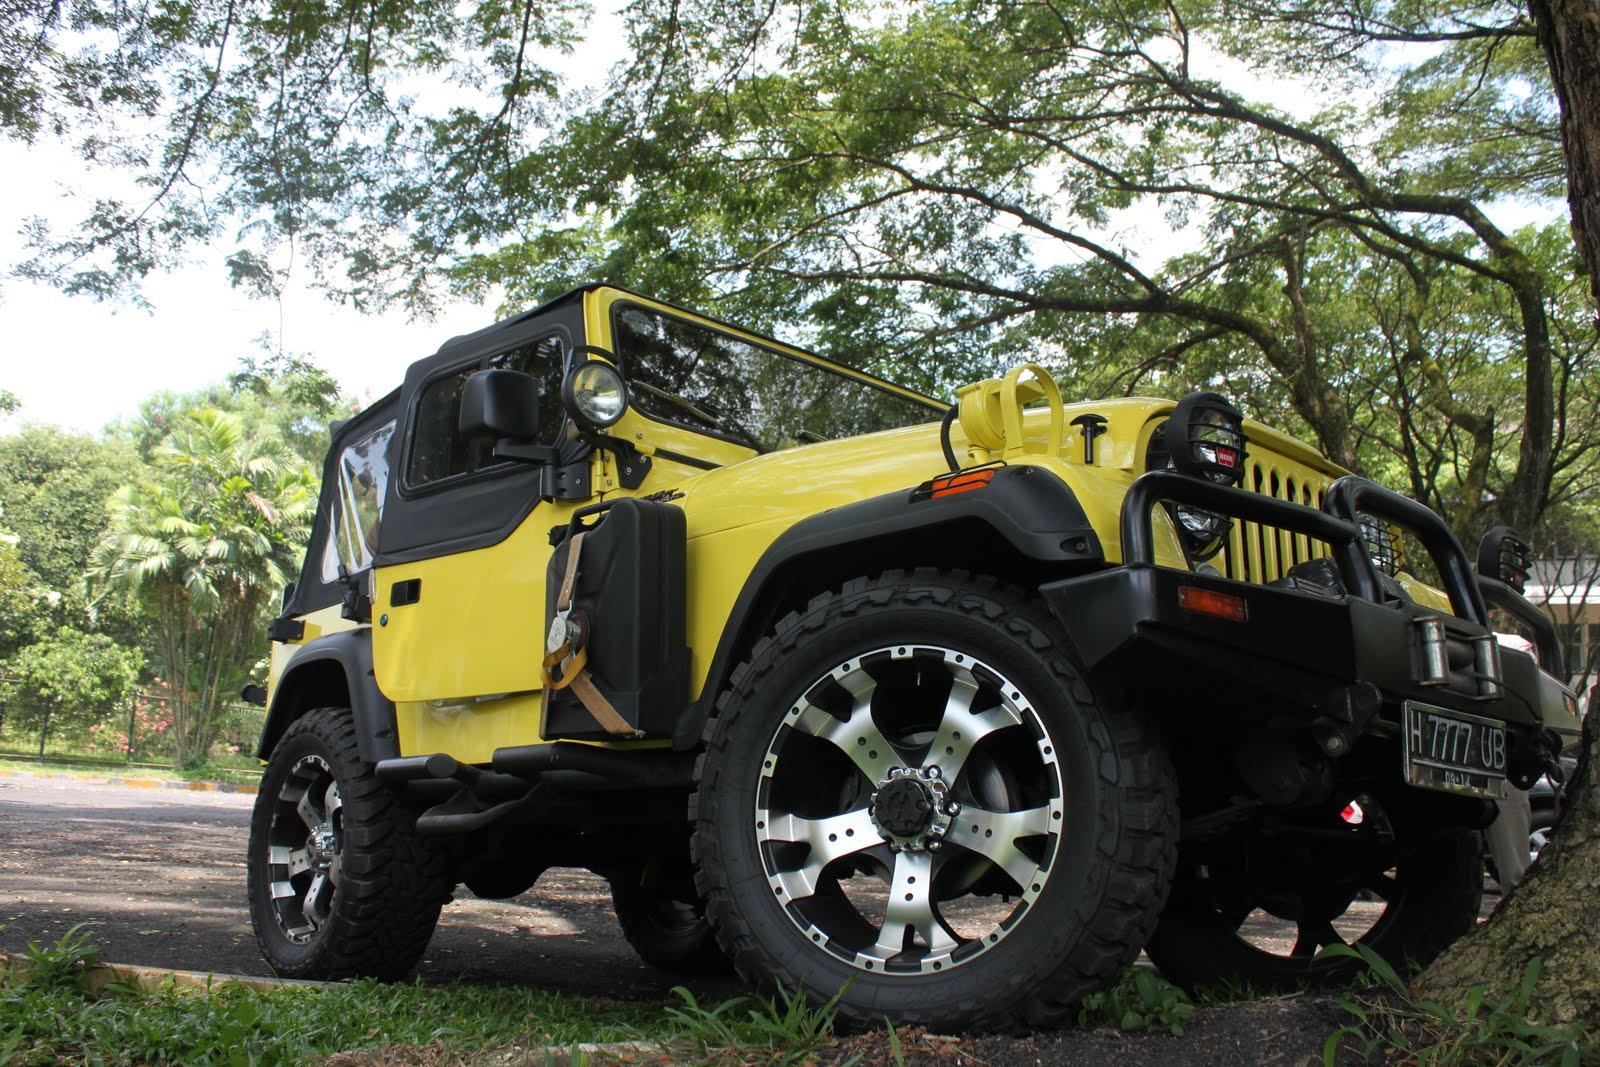 medan look modifikasi jeep cj7 ala andar perdana. Black Bedroom Furniture Sets. Home Design Ideas